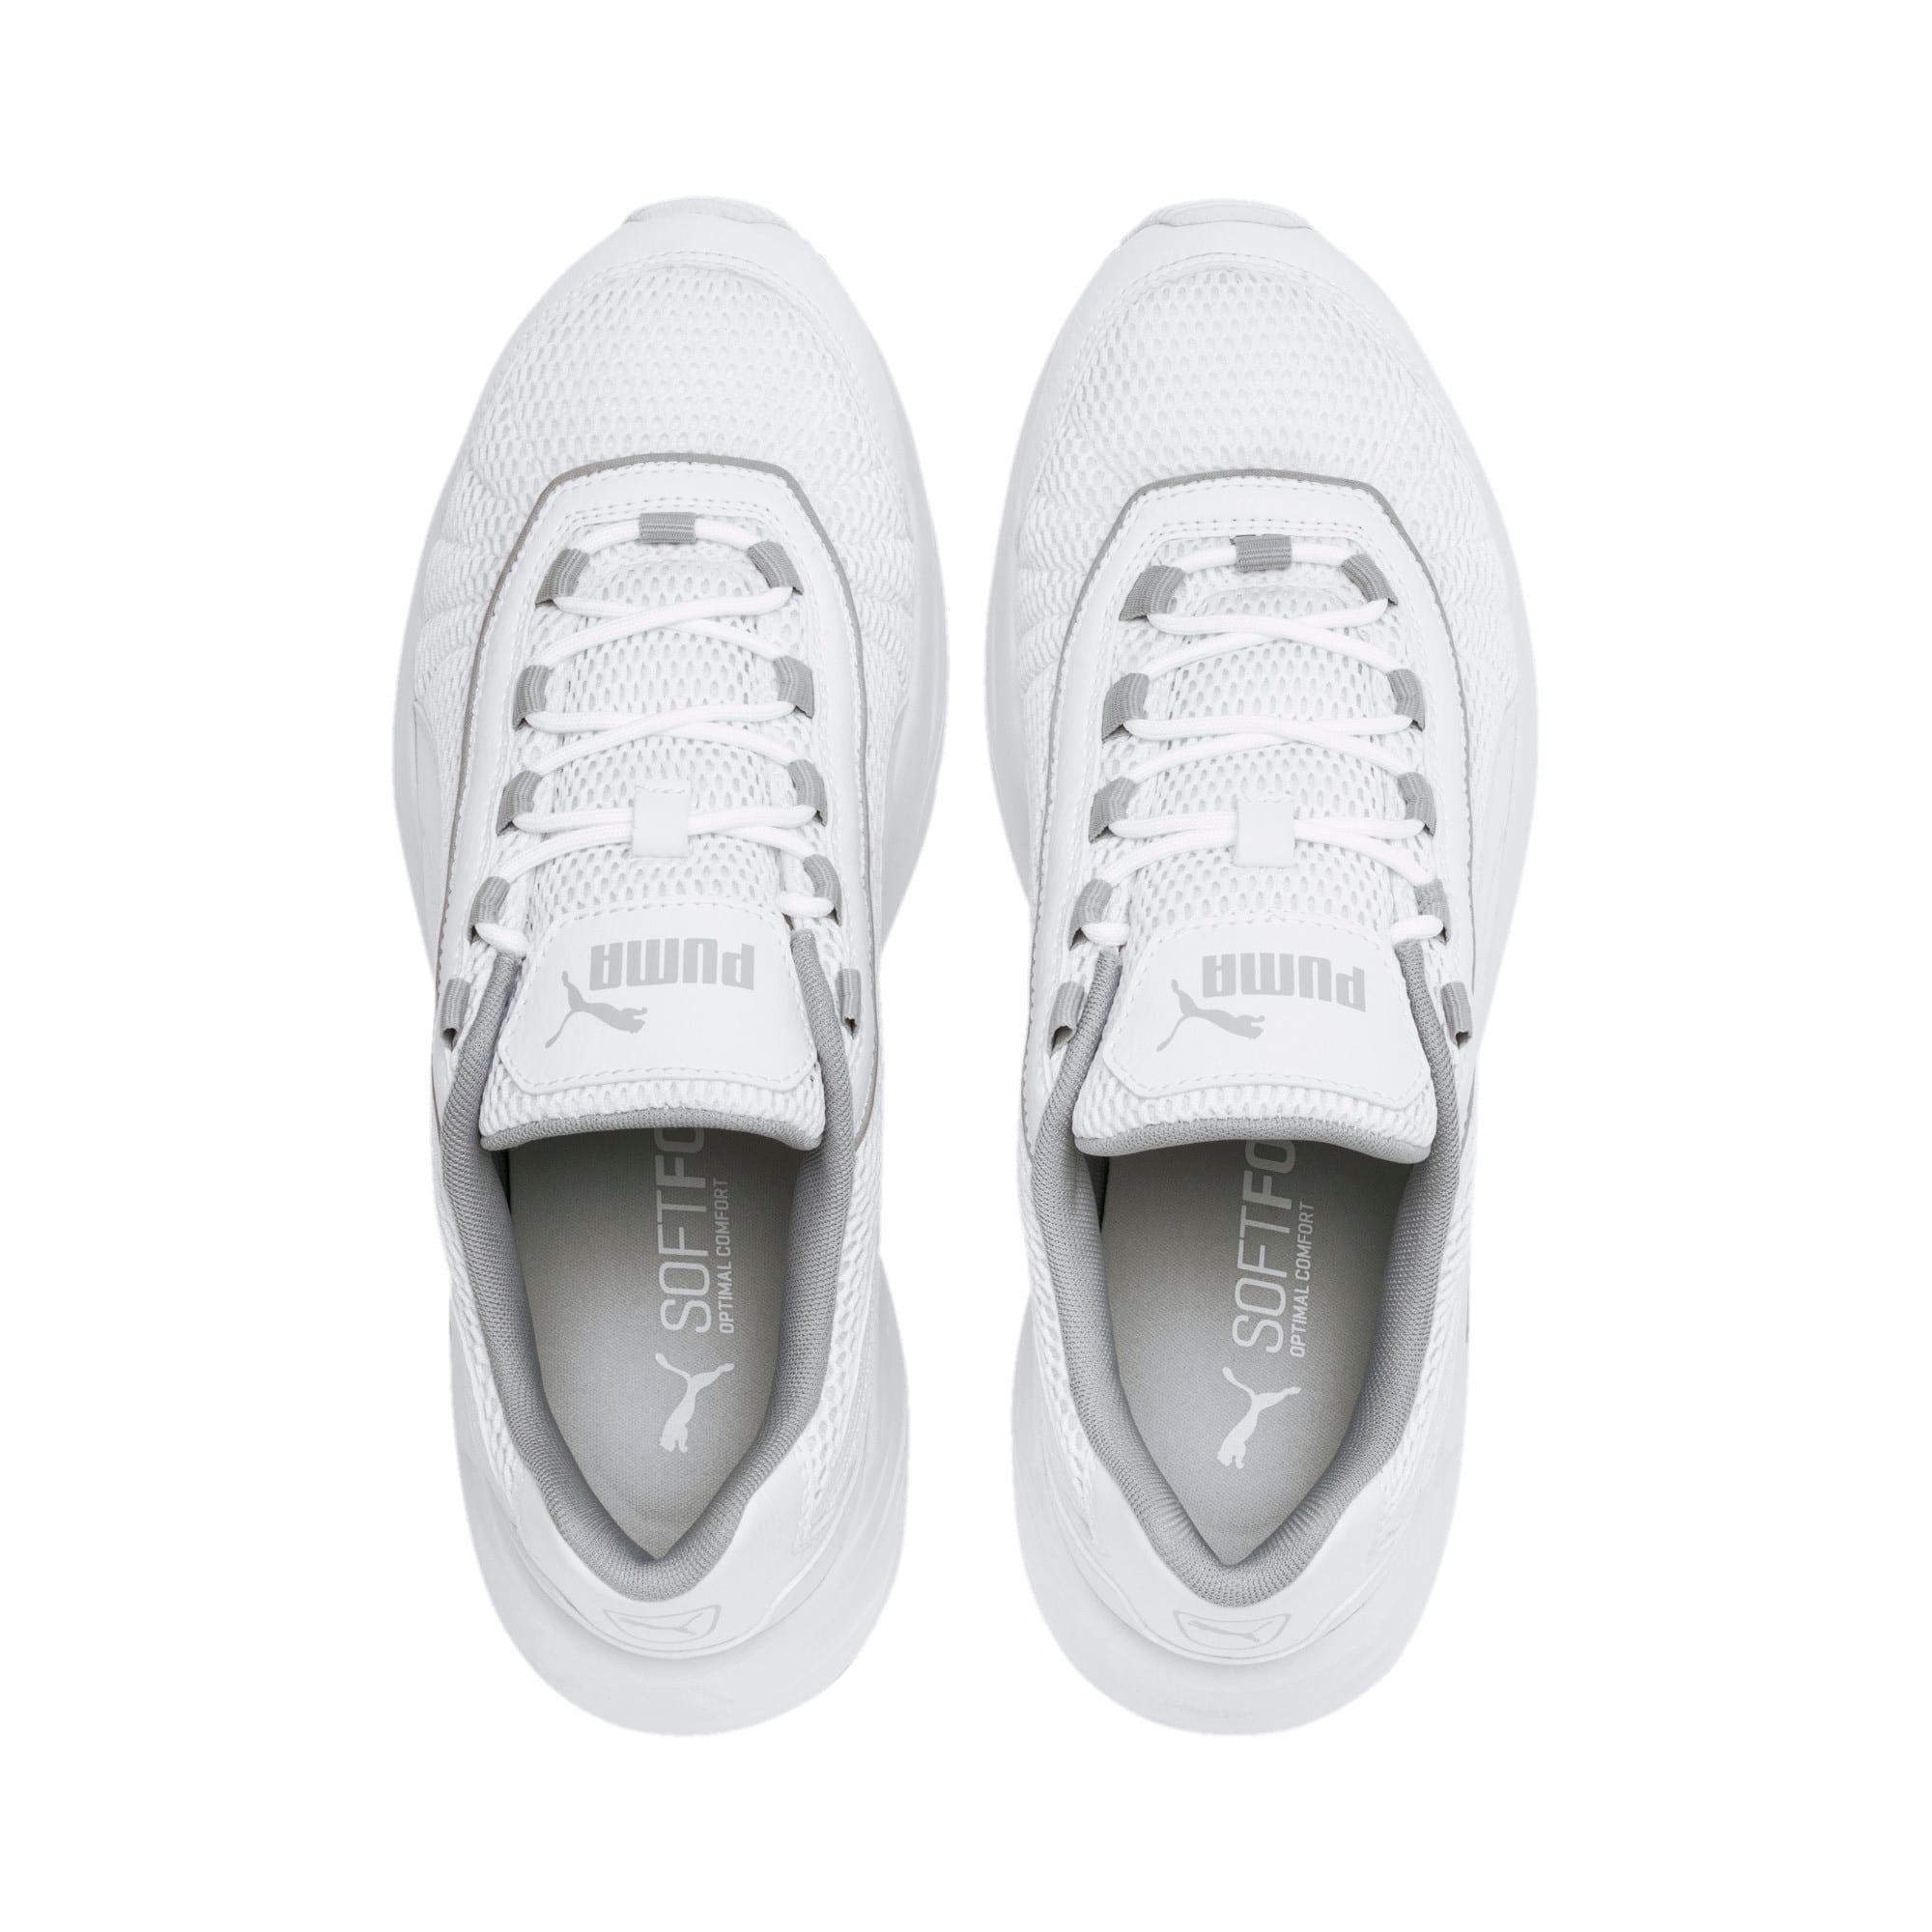 Thumbnail 7 of Nucleus Training Shoes, Puma White-High Rise, medium